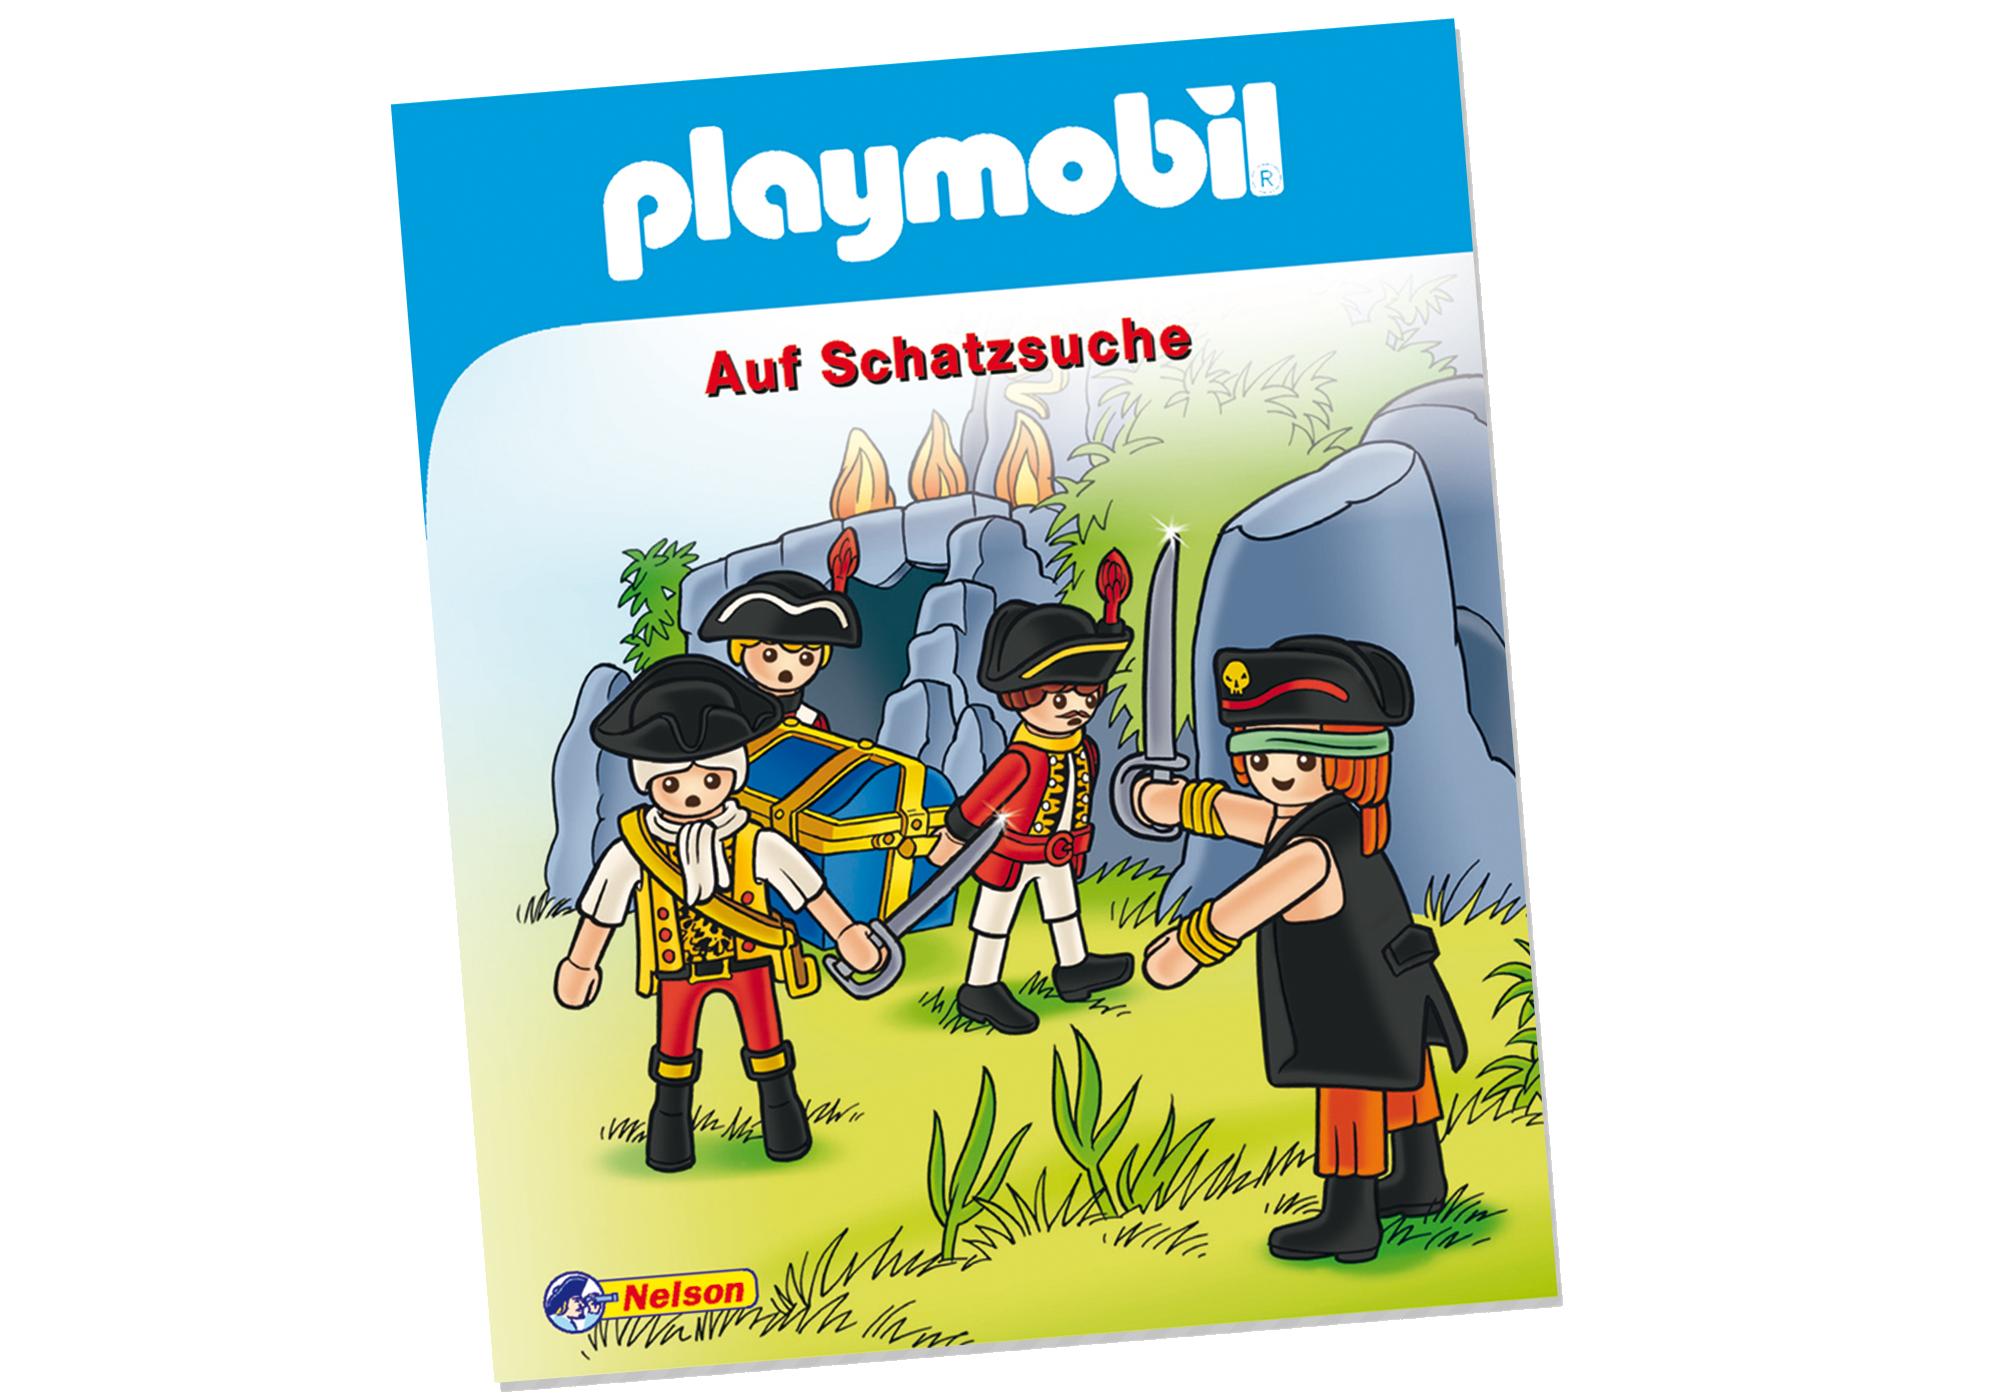 http://media.playmobil.com/i/playmobil/80239_product_detail